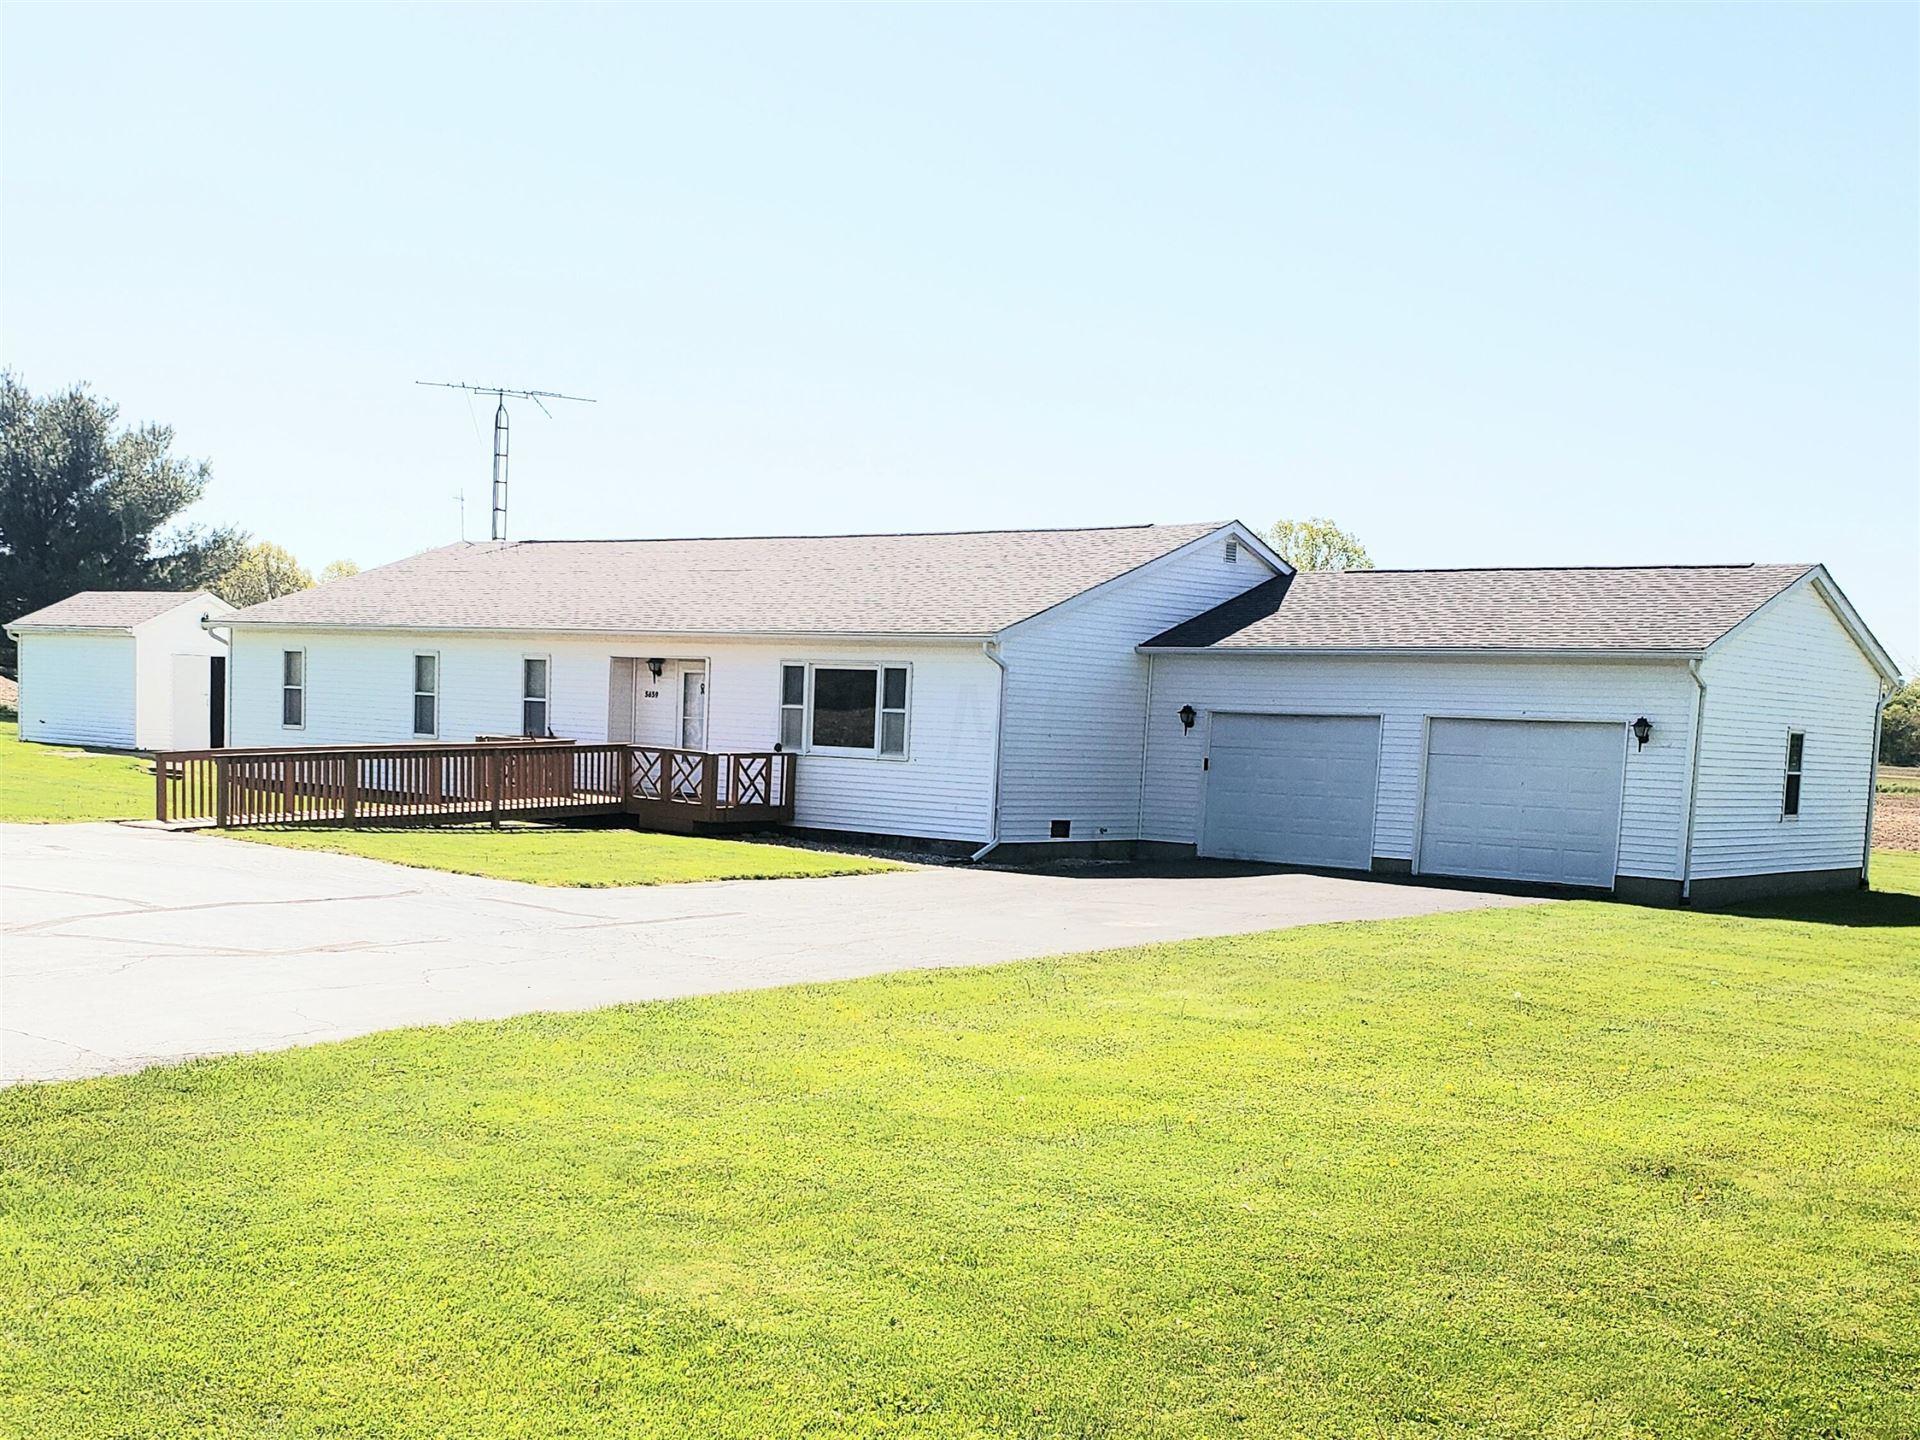 Photo of 5659 Marion Edison Road, Caledonia, OH 43314 (MLS # 221015913)